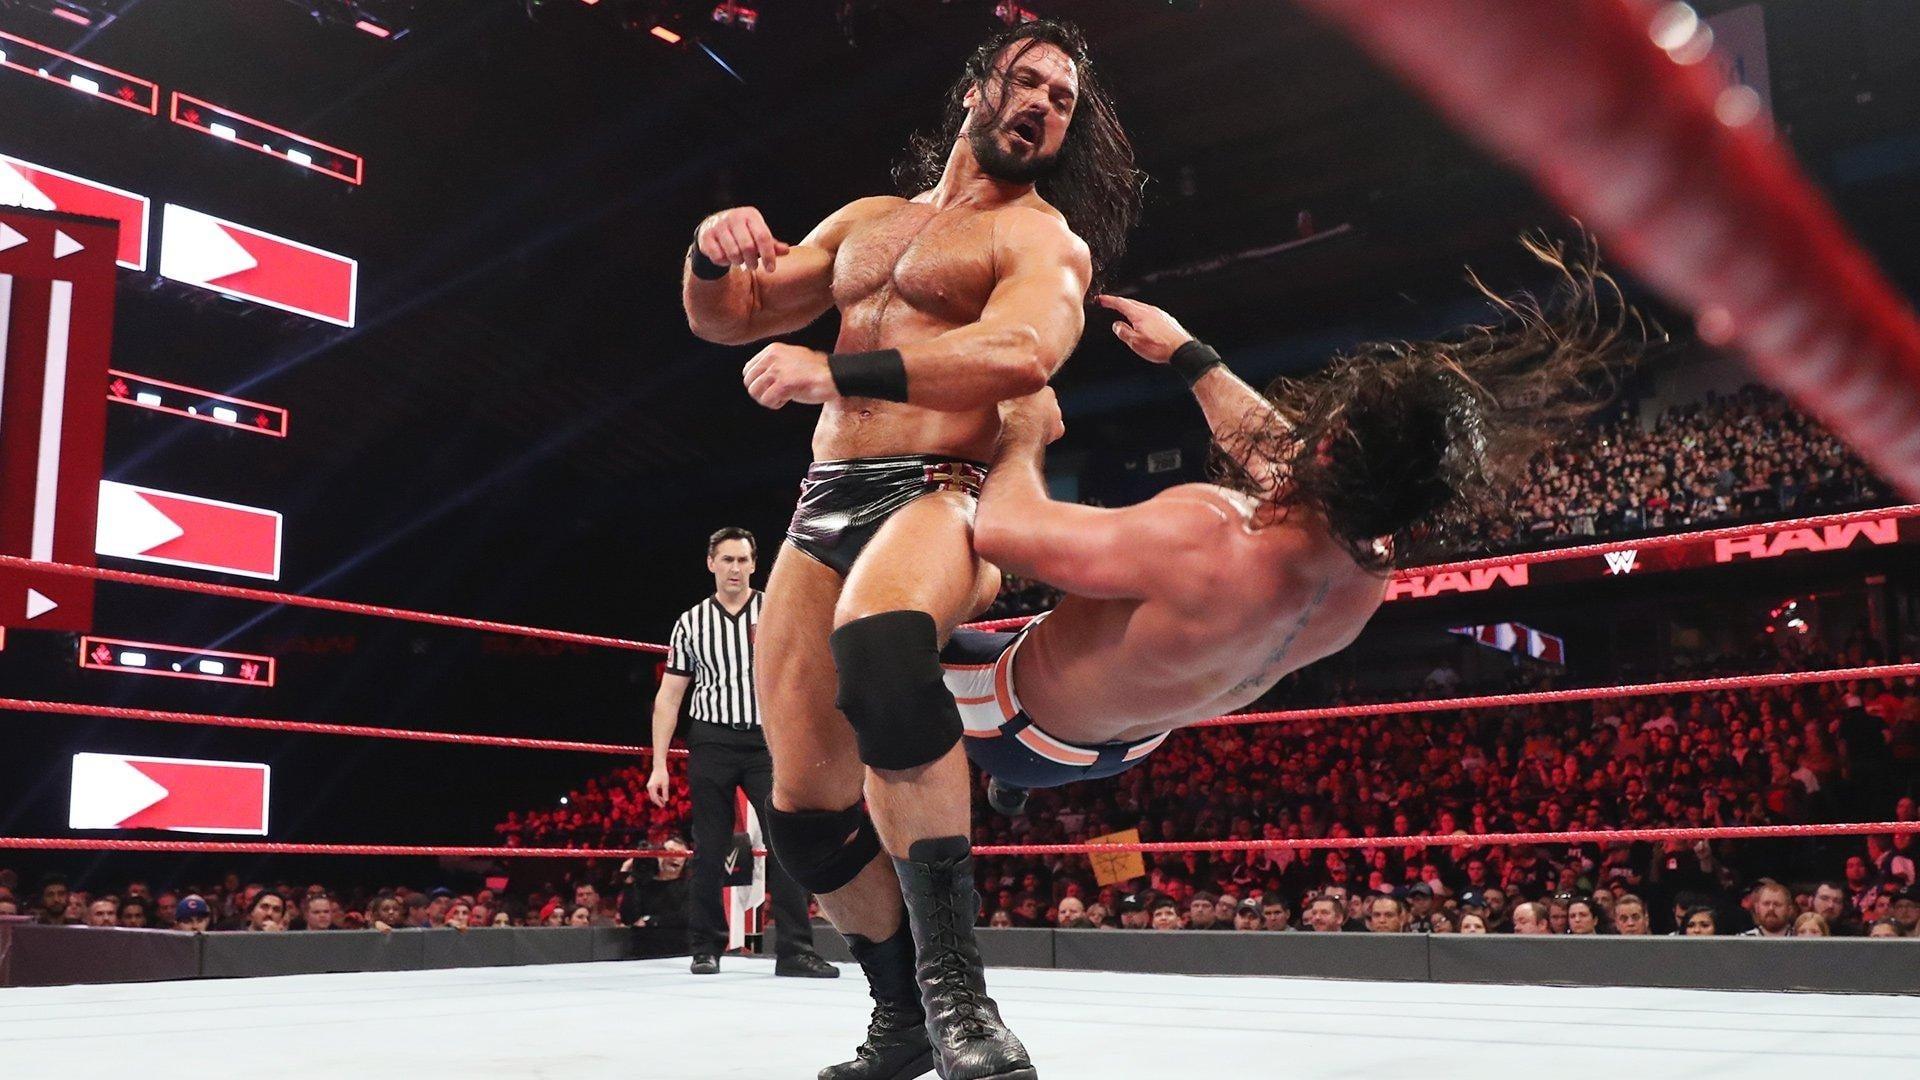 WWE Raw Season 27 :Episode 11  March 18, 2019 (Chicago, IL)